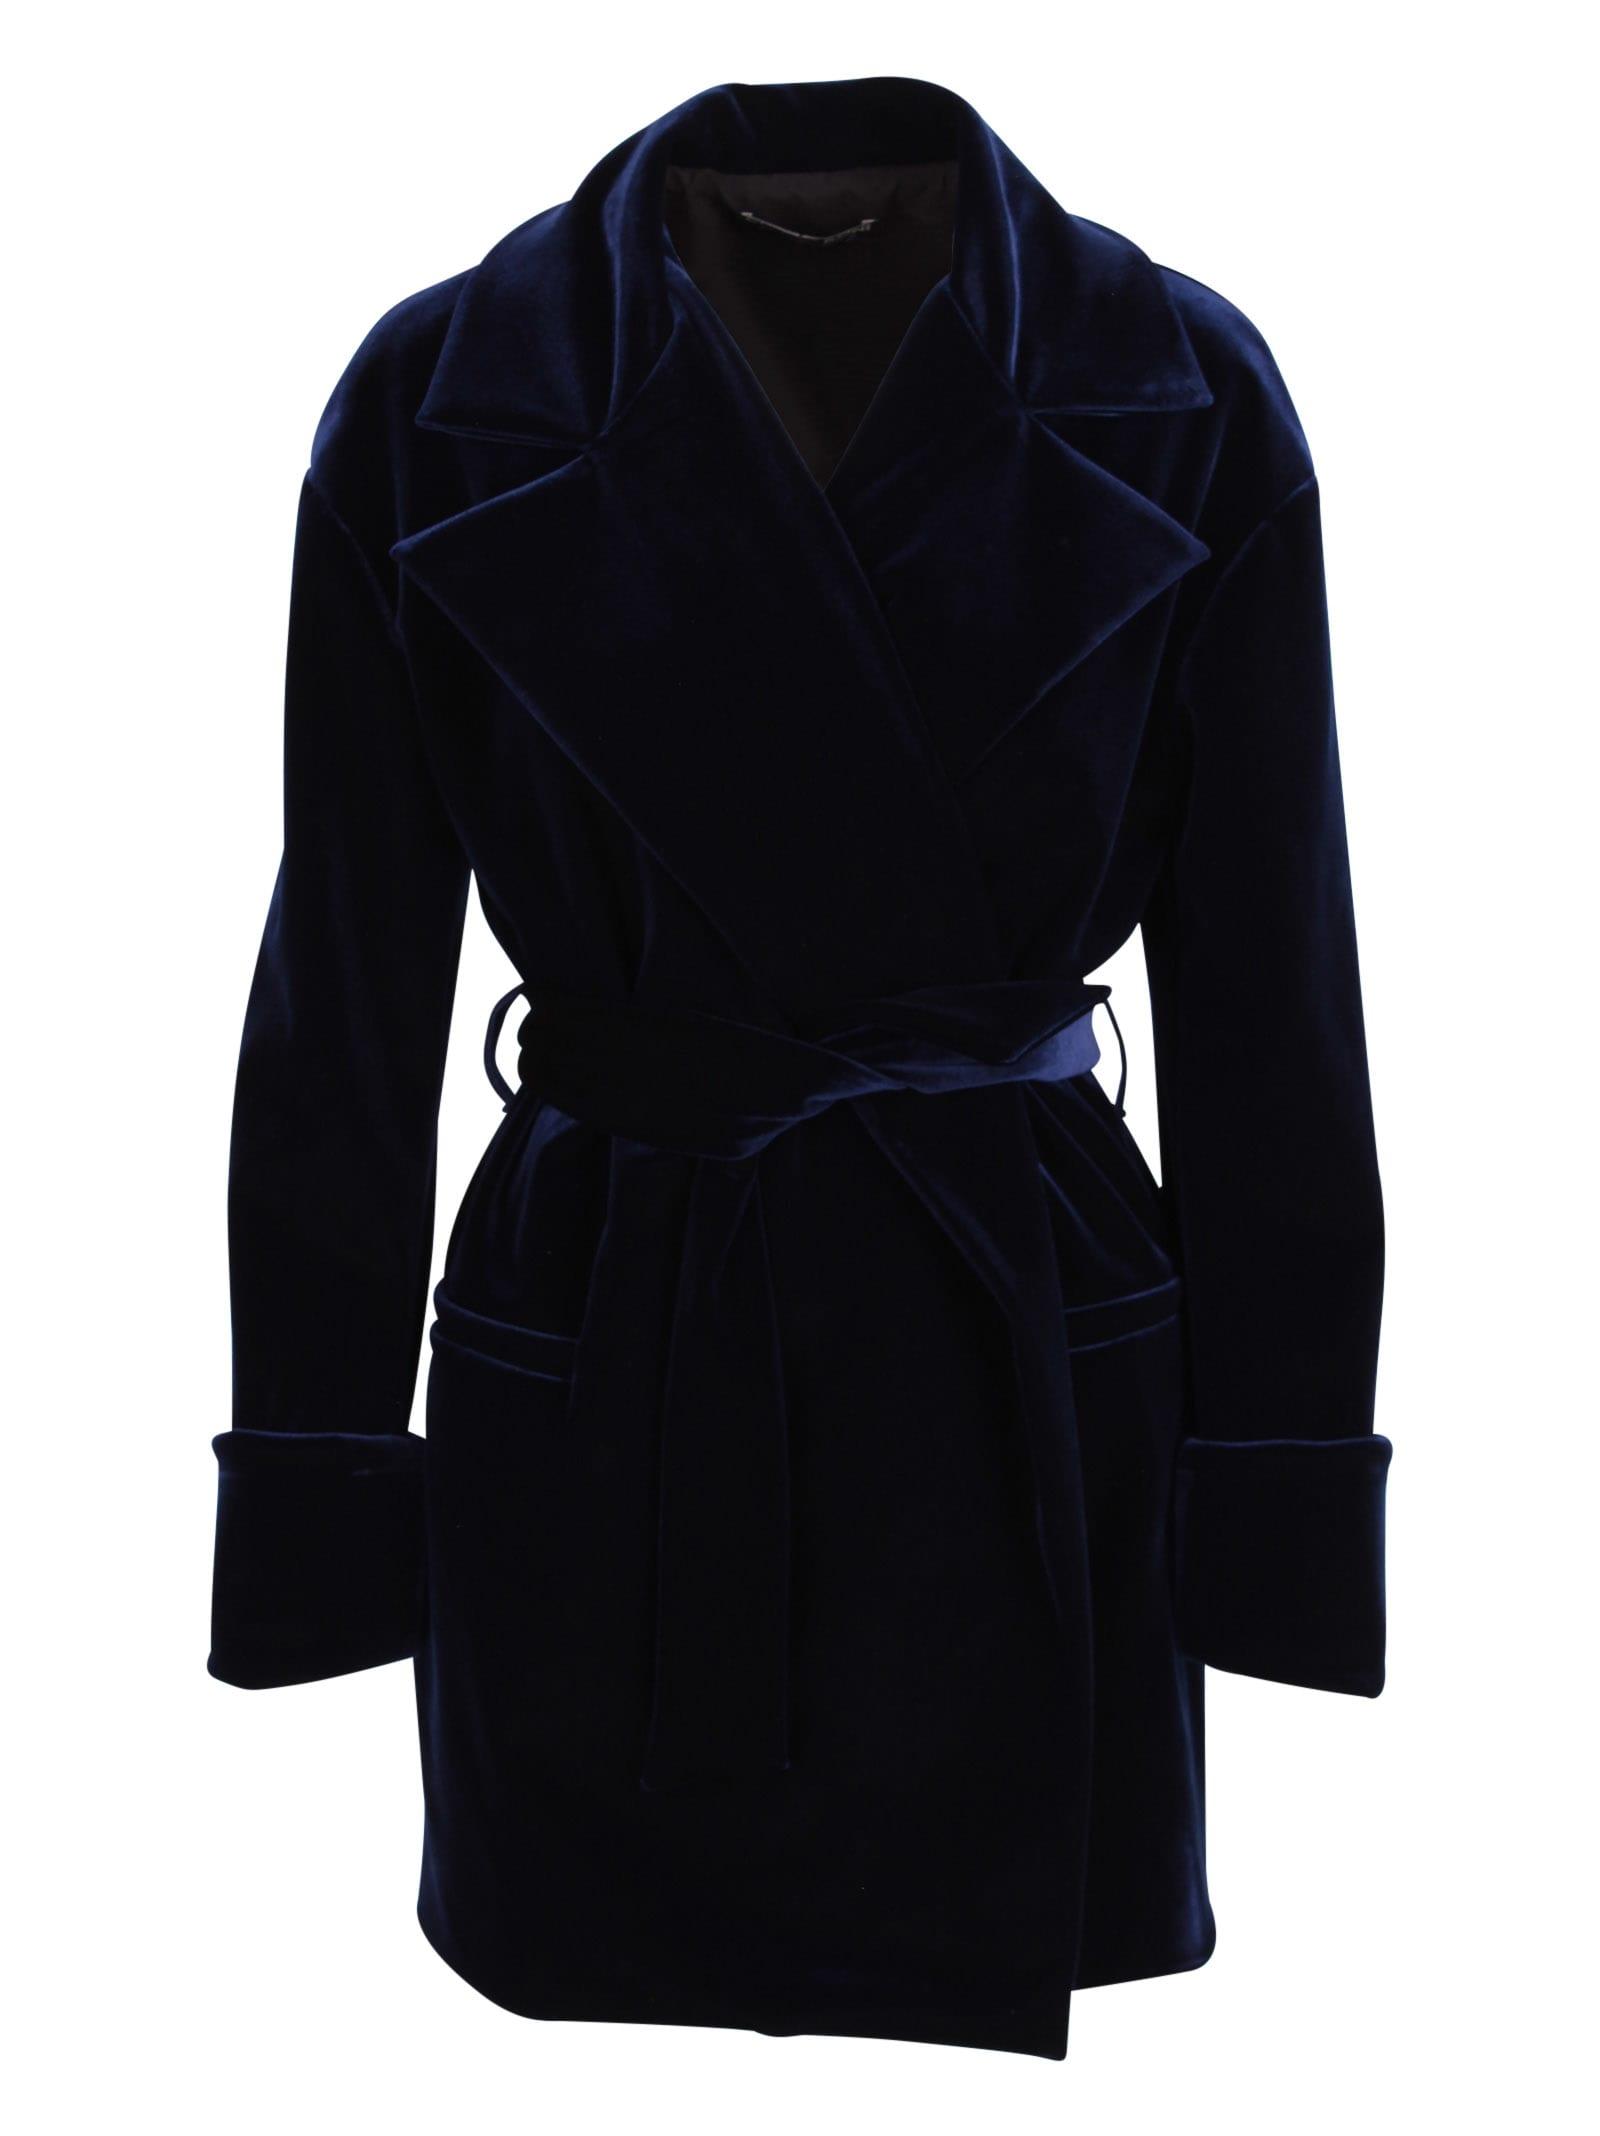 Le Petite Robe Di Chiara Boni Glafira Velvet Jacket